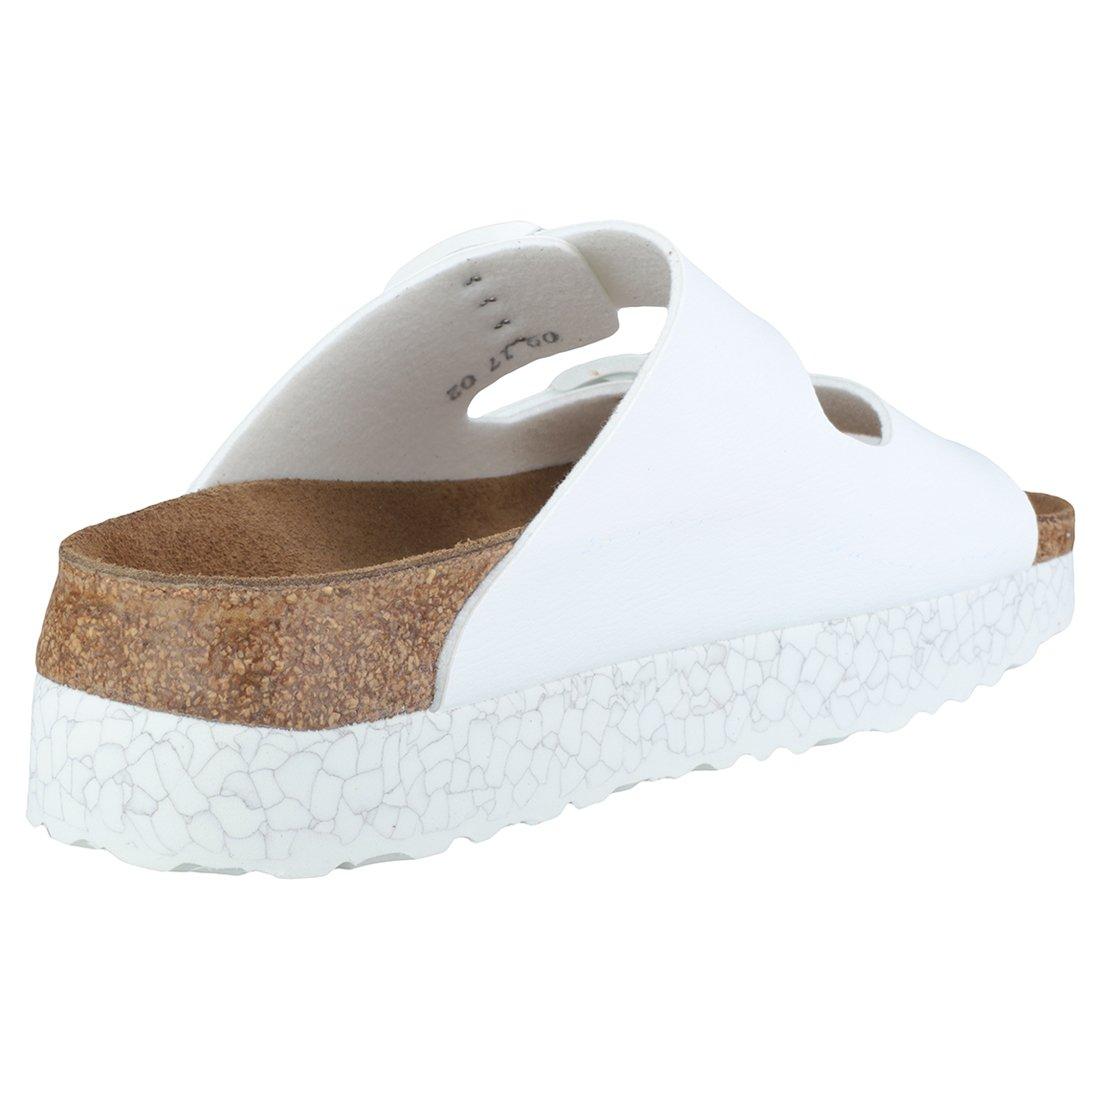 Papillio Monochrome  Arizona, Damen Sandalen Monochrome Papillio Marble Weiß 488f4b